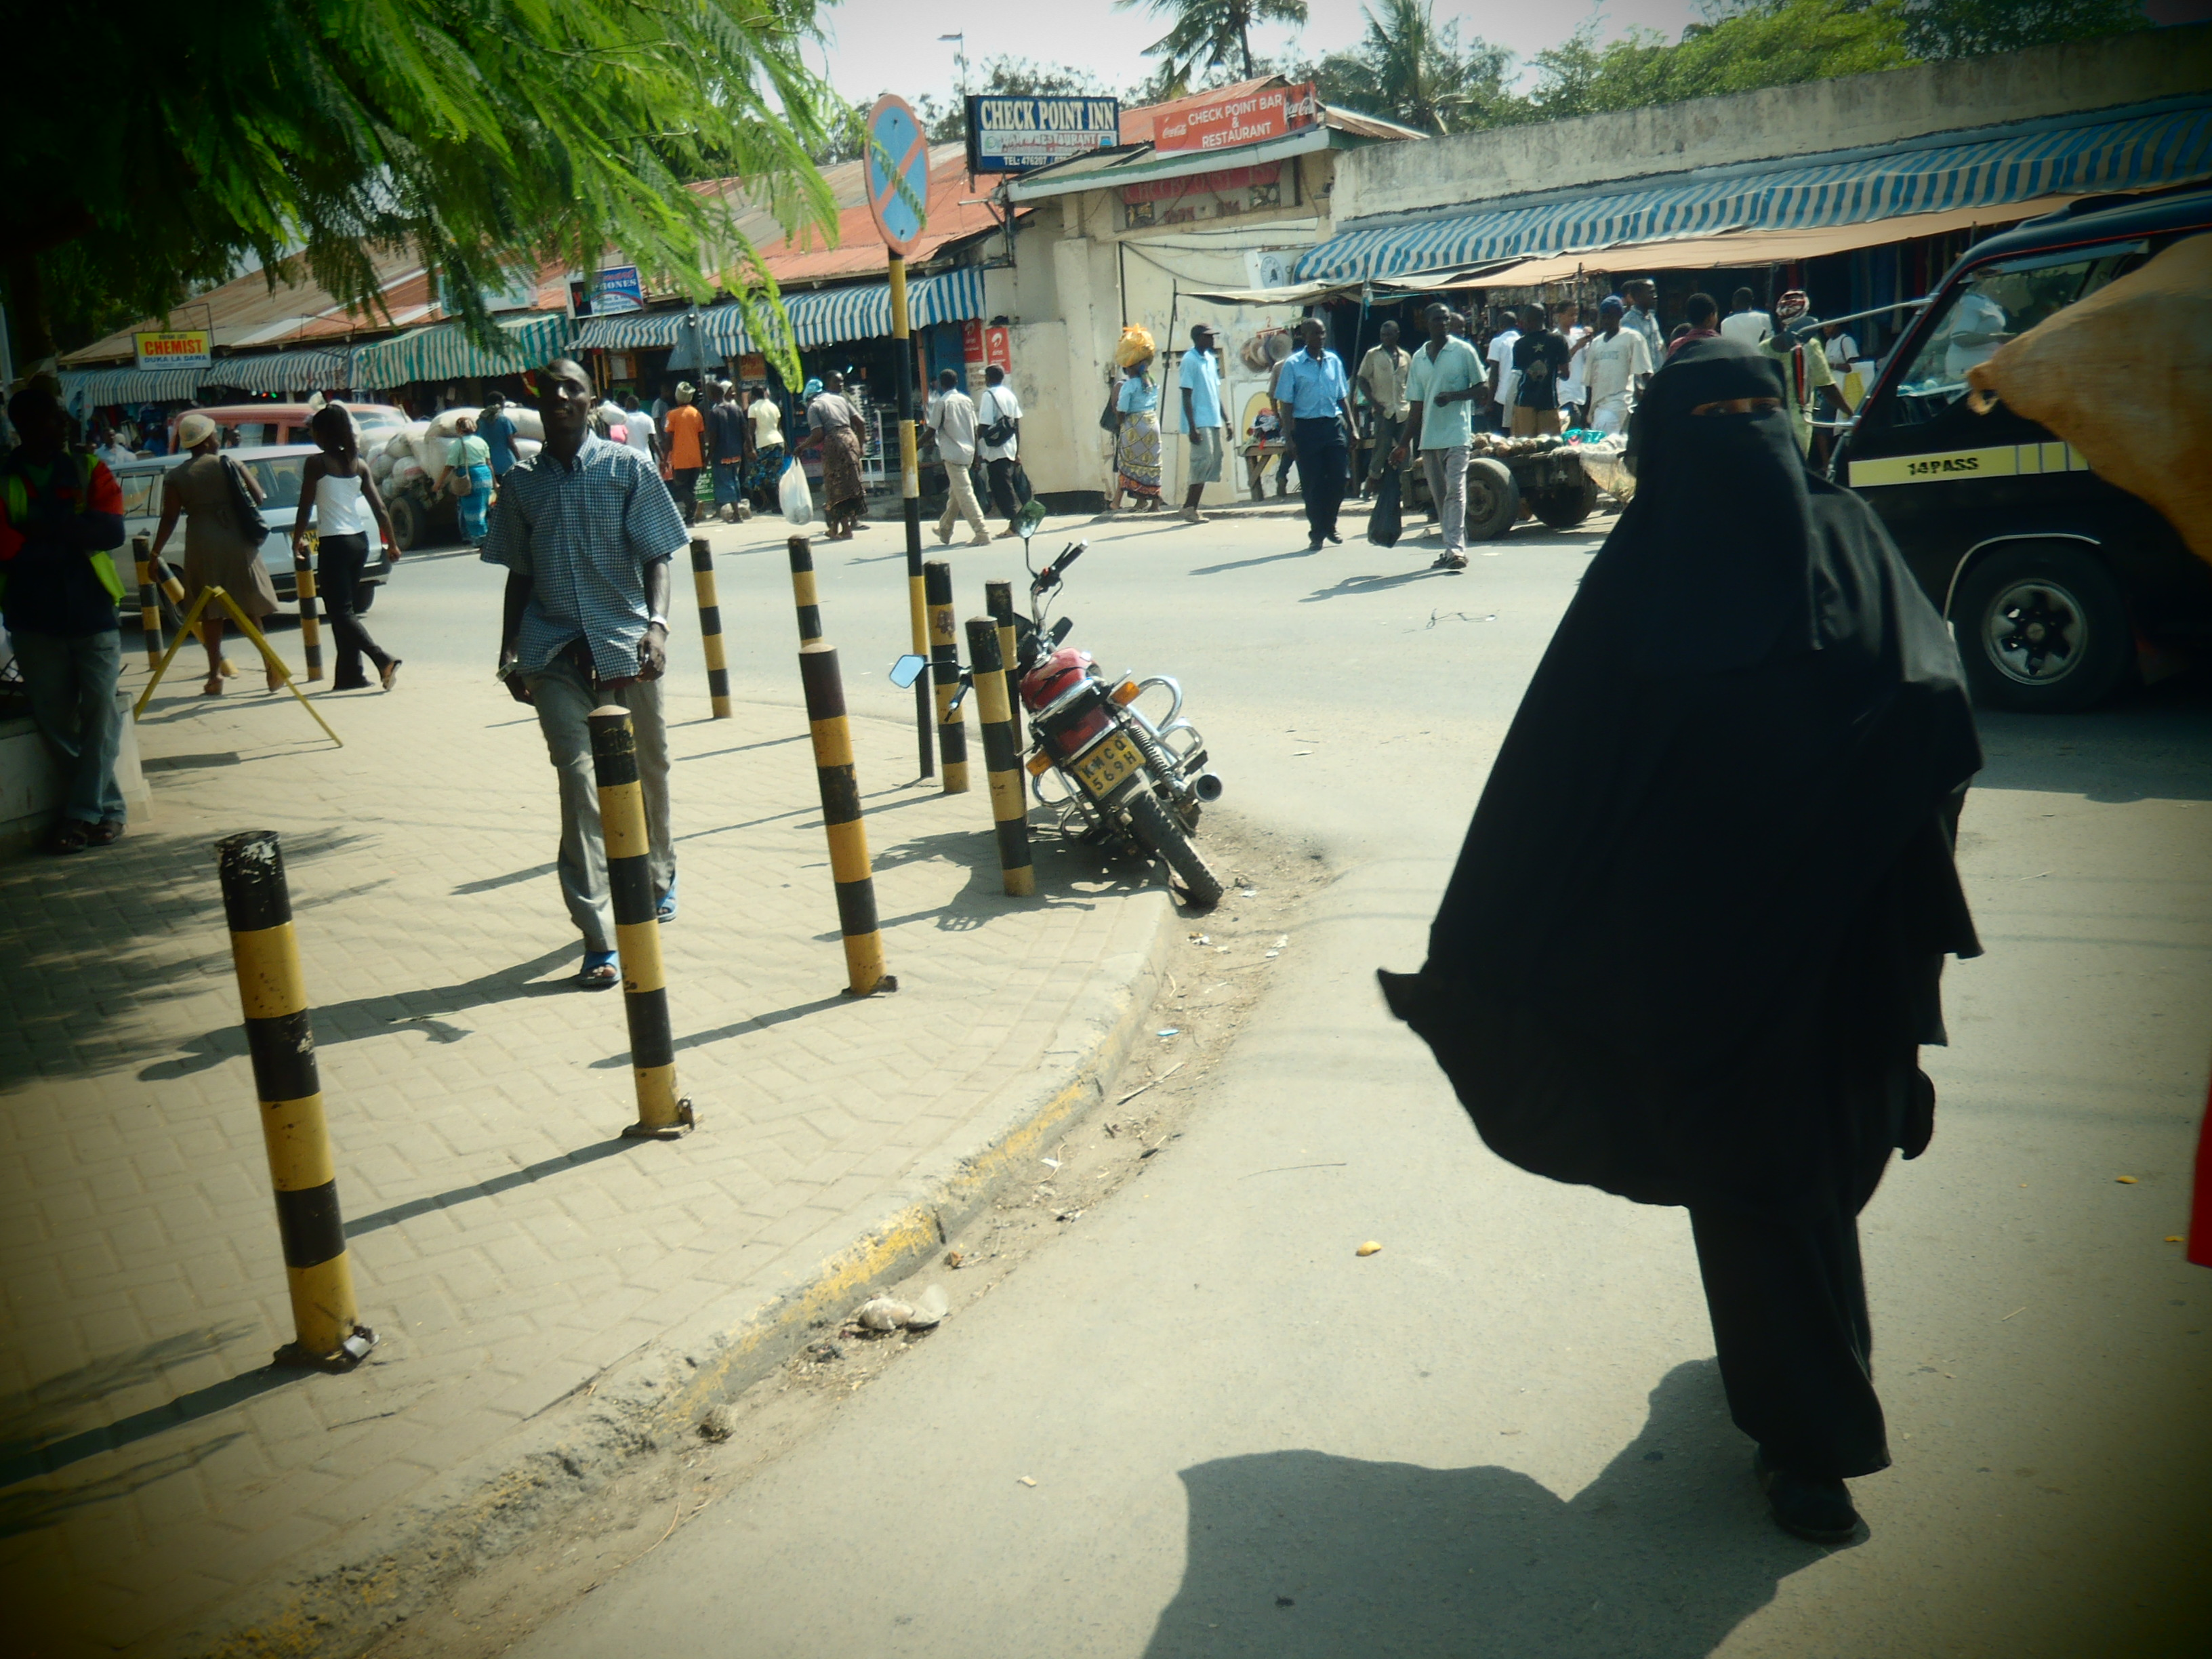 Busy Streets; Mombasa, Kenya; 2011